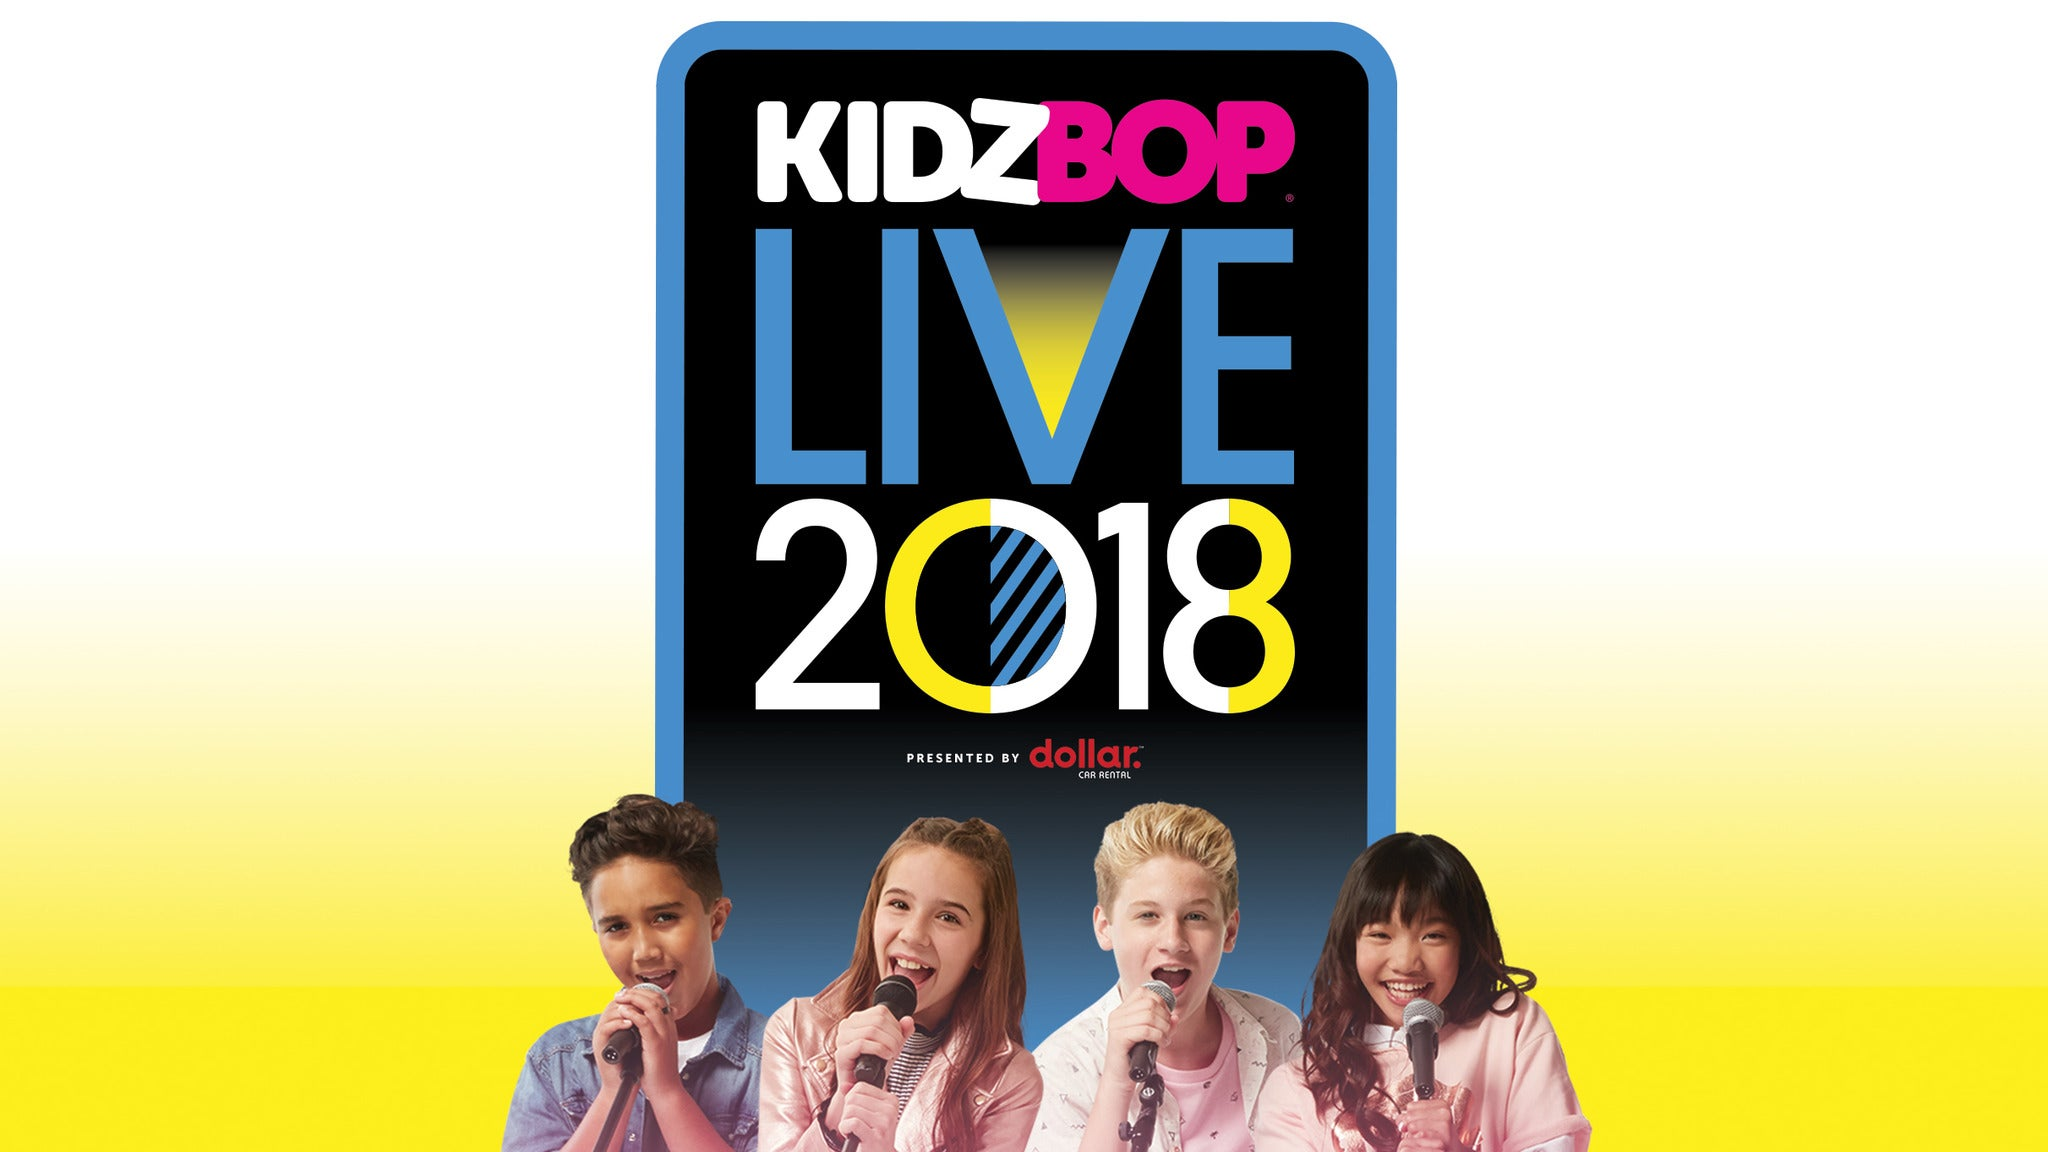 KIDZ BOP Live 2018 Tour presented by Dollar Car Rental